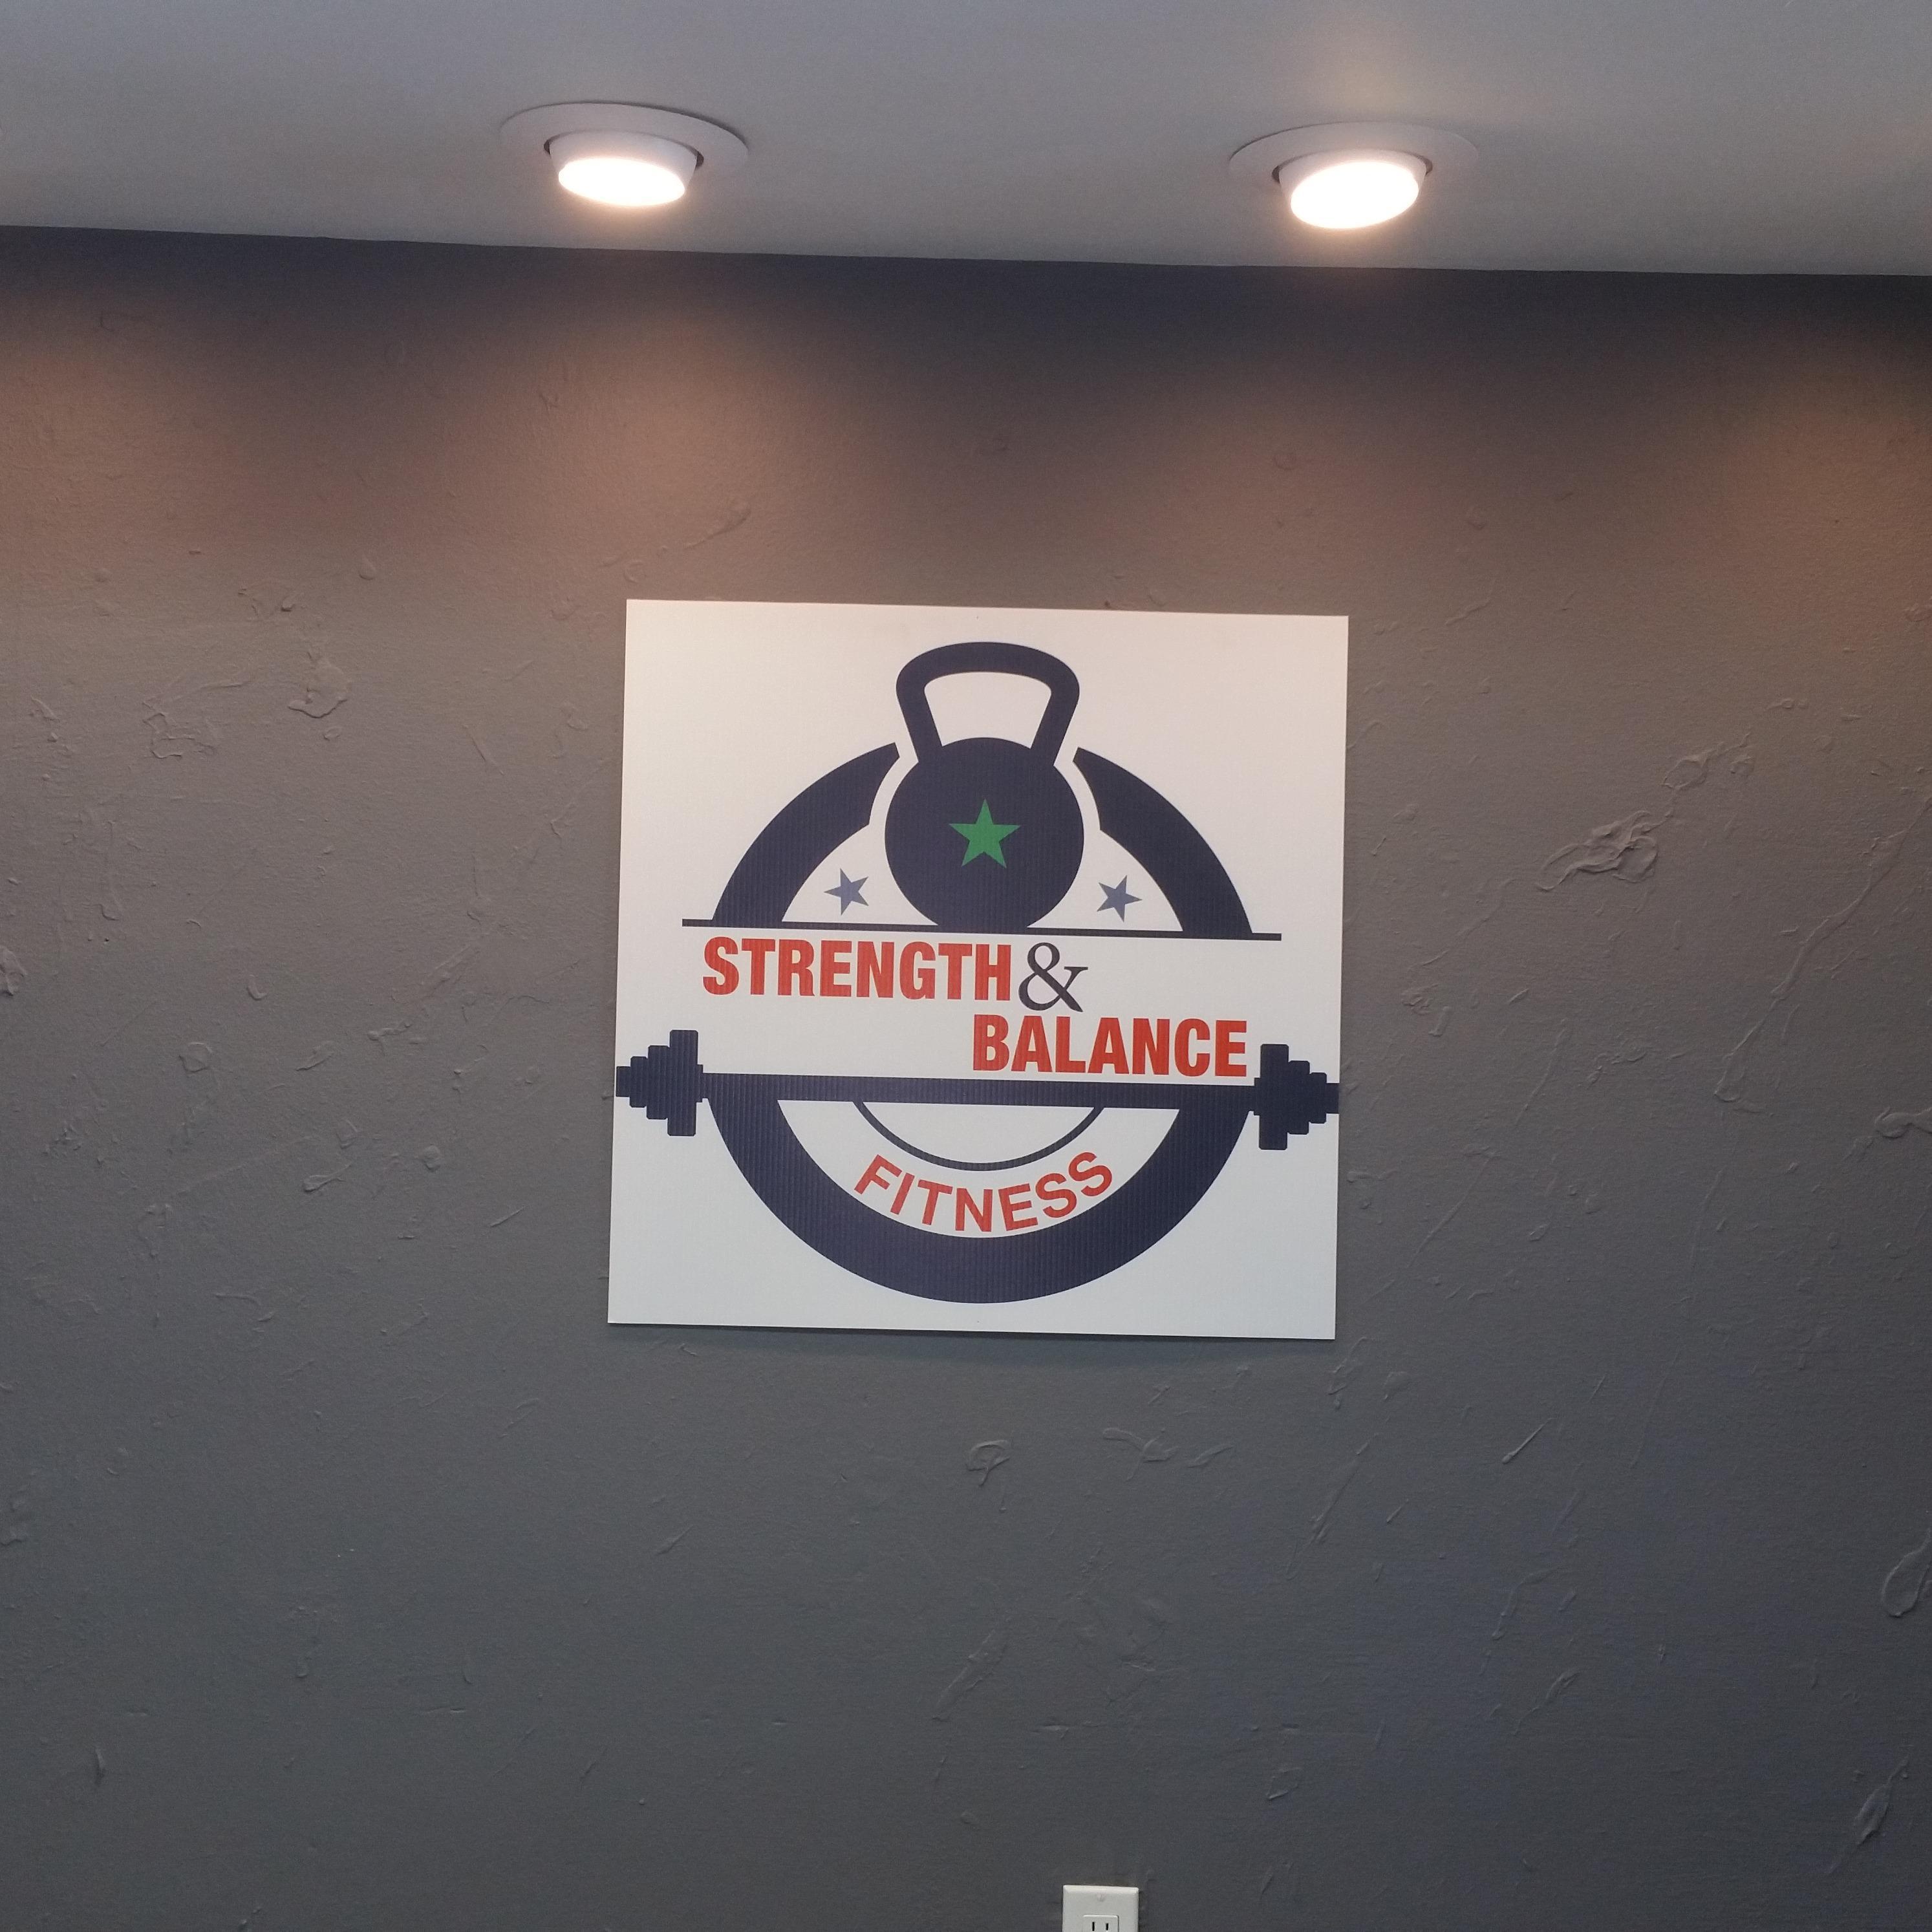 Strength and Balance Fitness